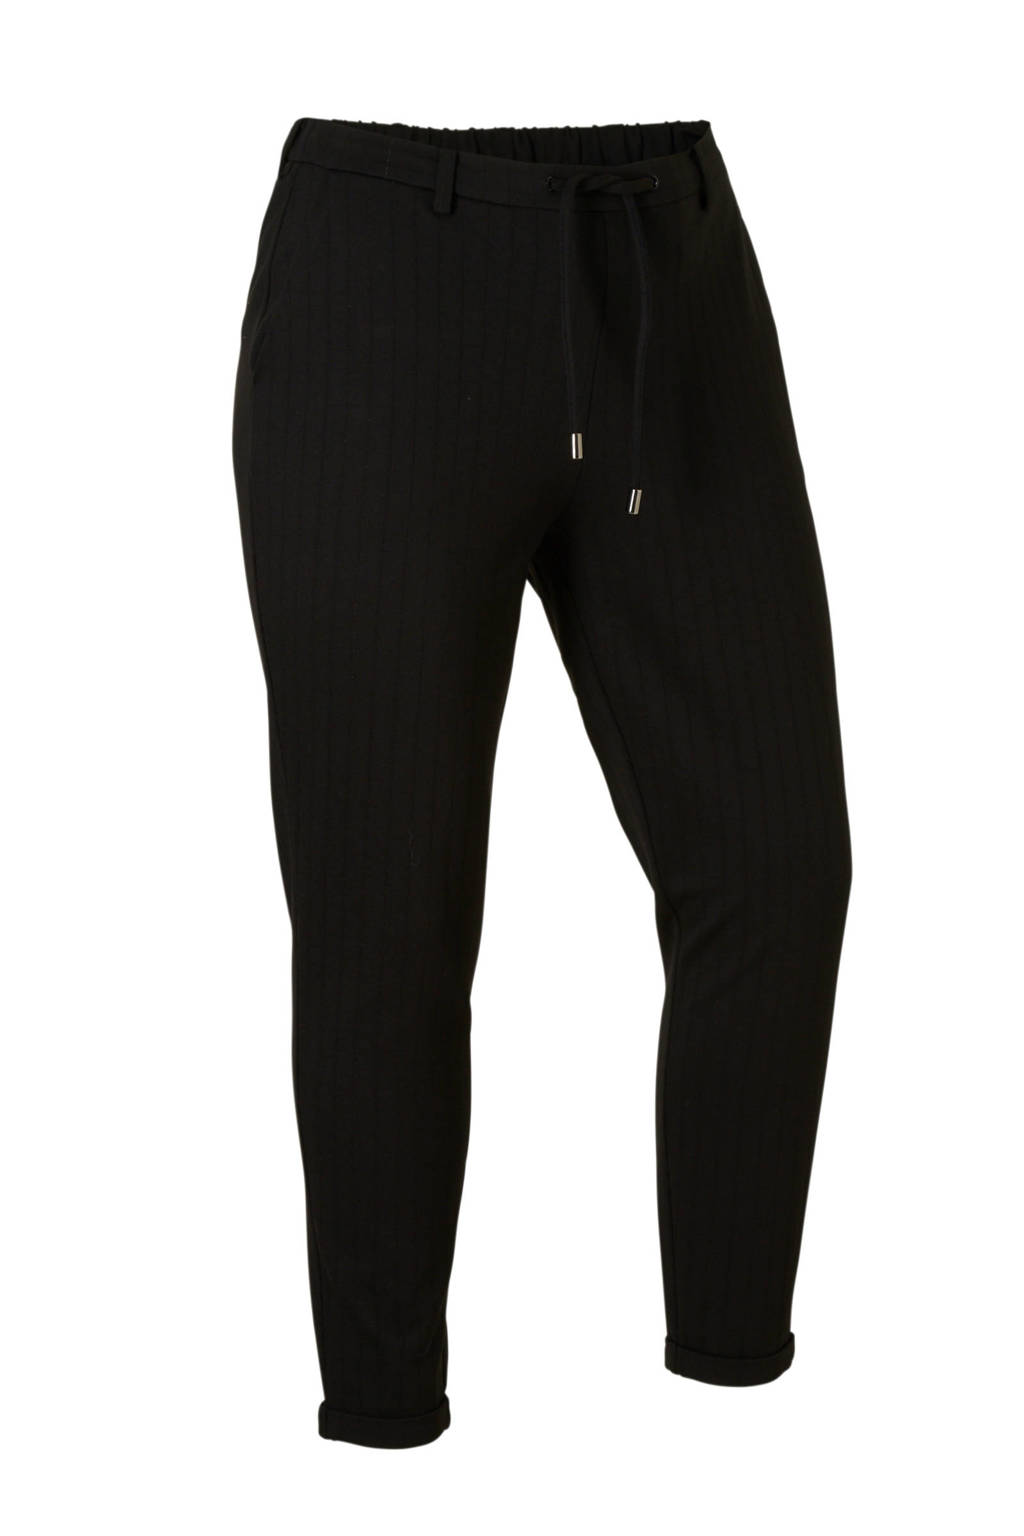 Zizzi cropped broek, Zwart